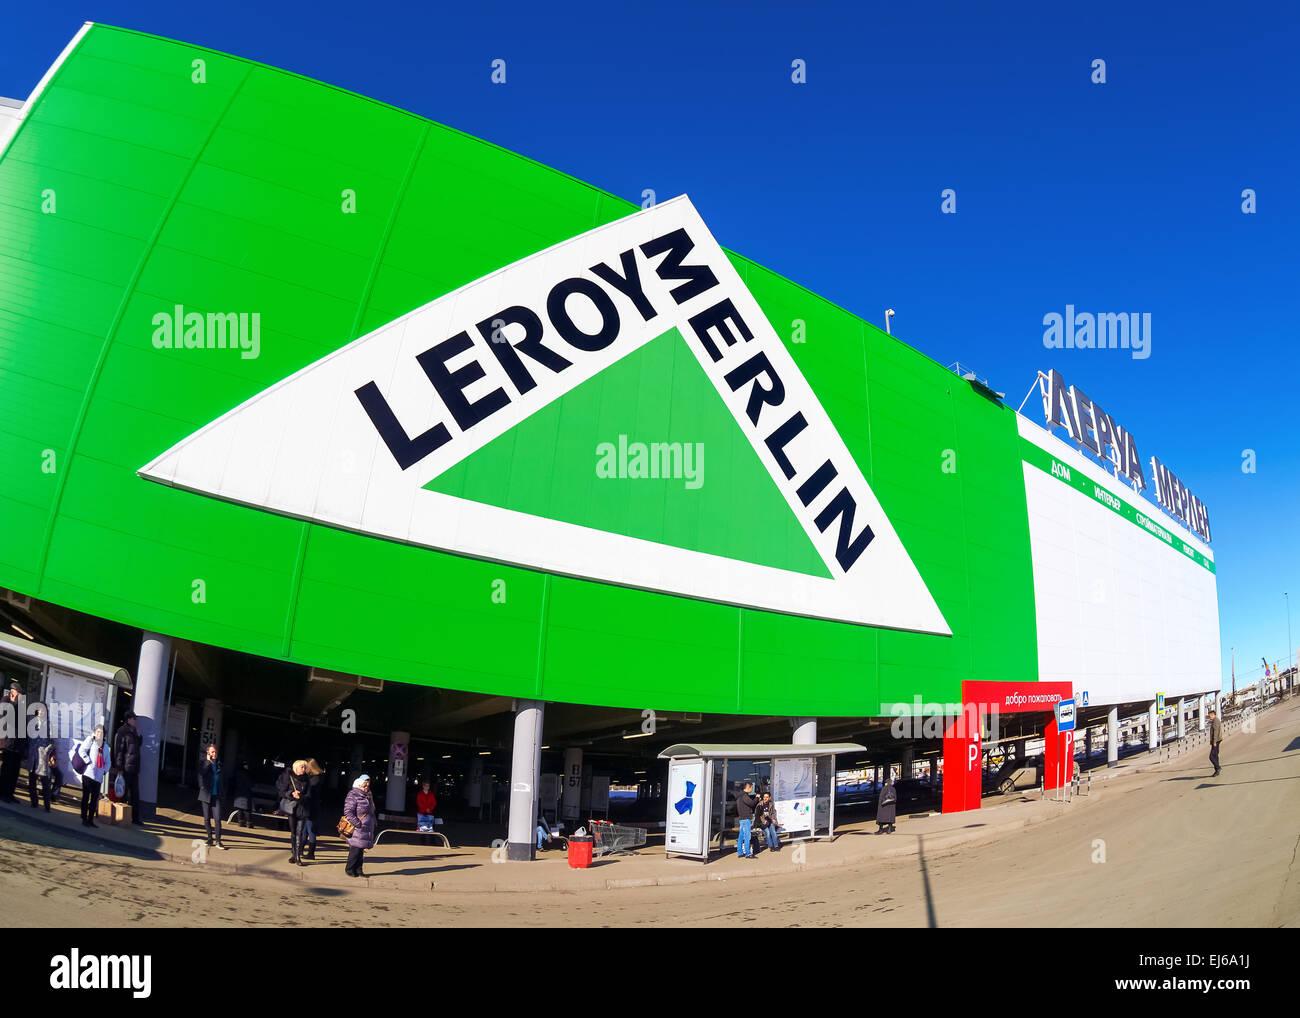 Leroy merlin samara store stock photo: 80044878 alamy